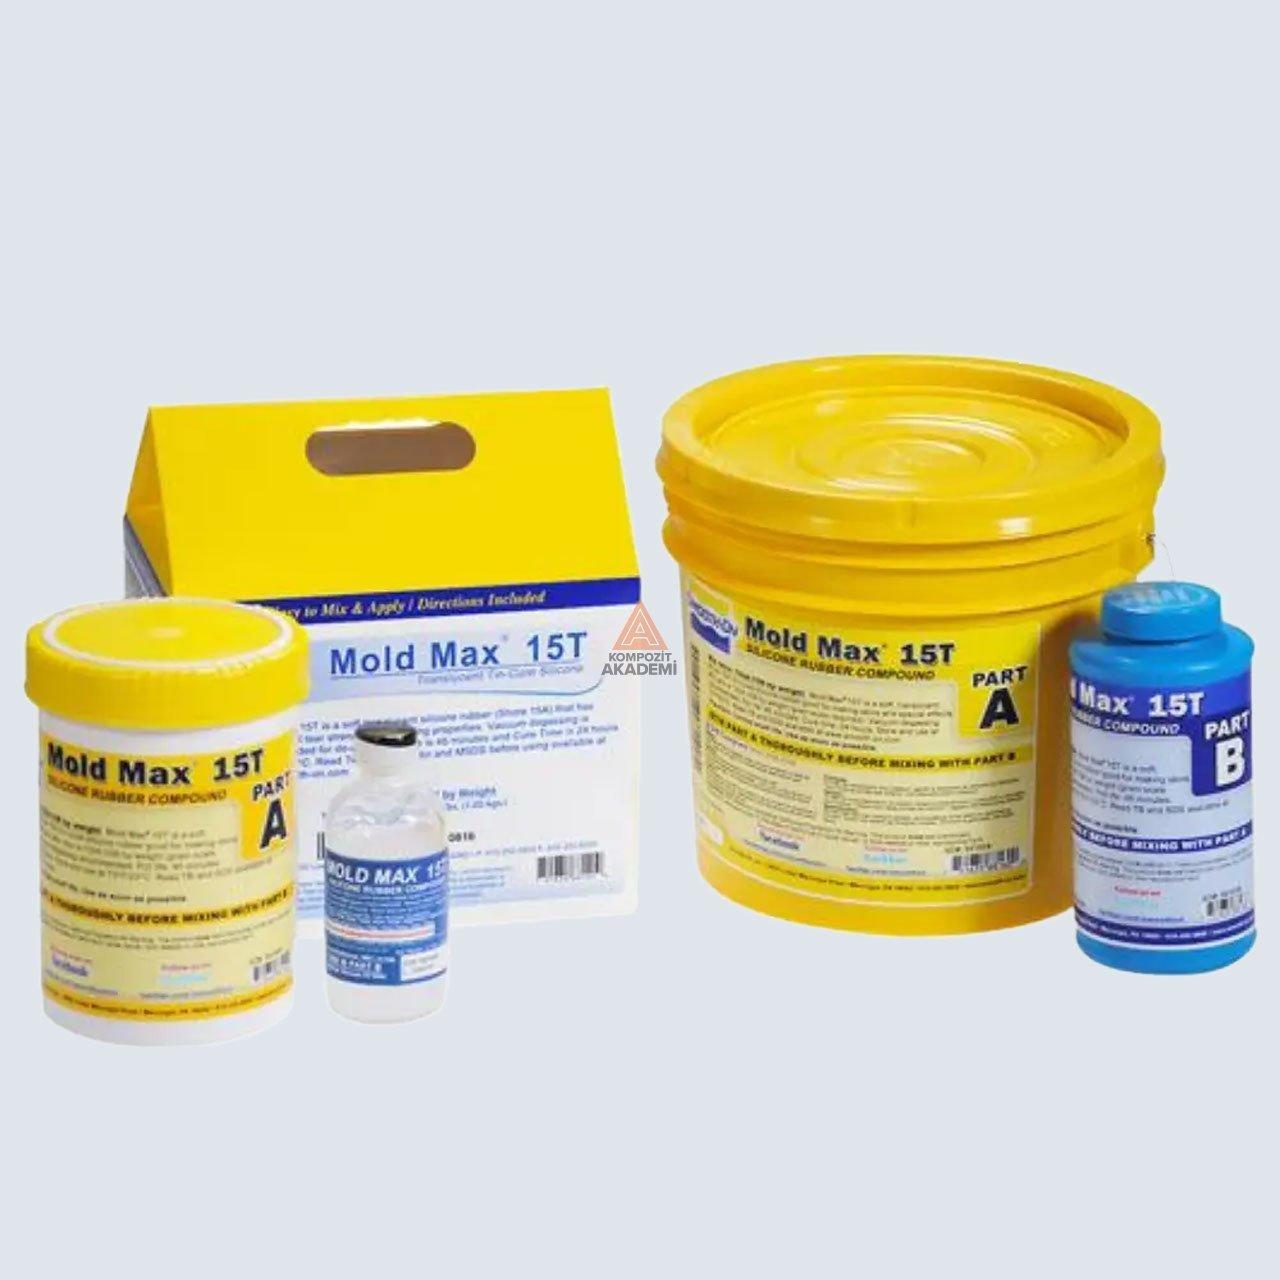 Mold Max 15T Şeffaf Kalıp Silikonu